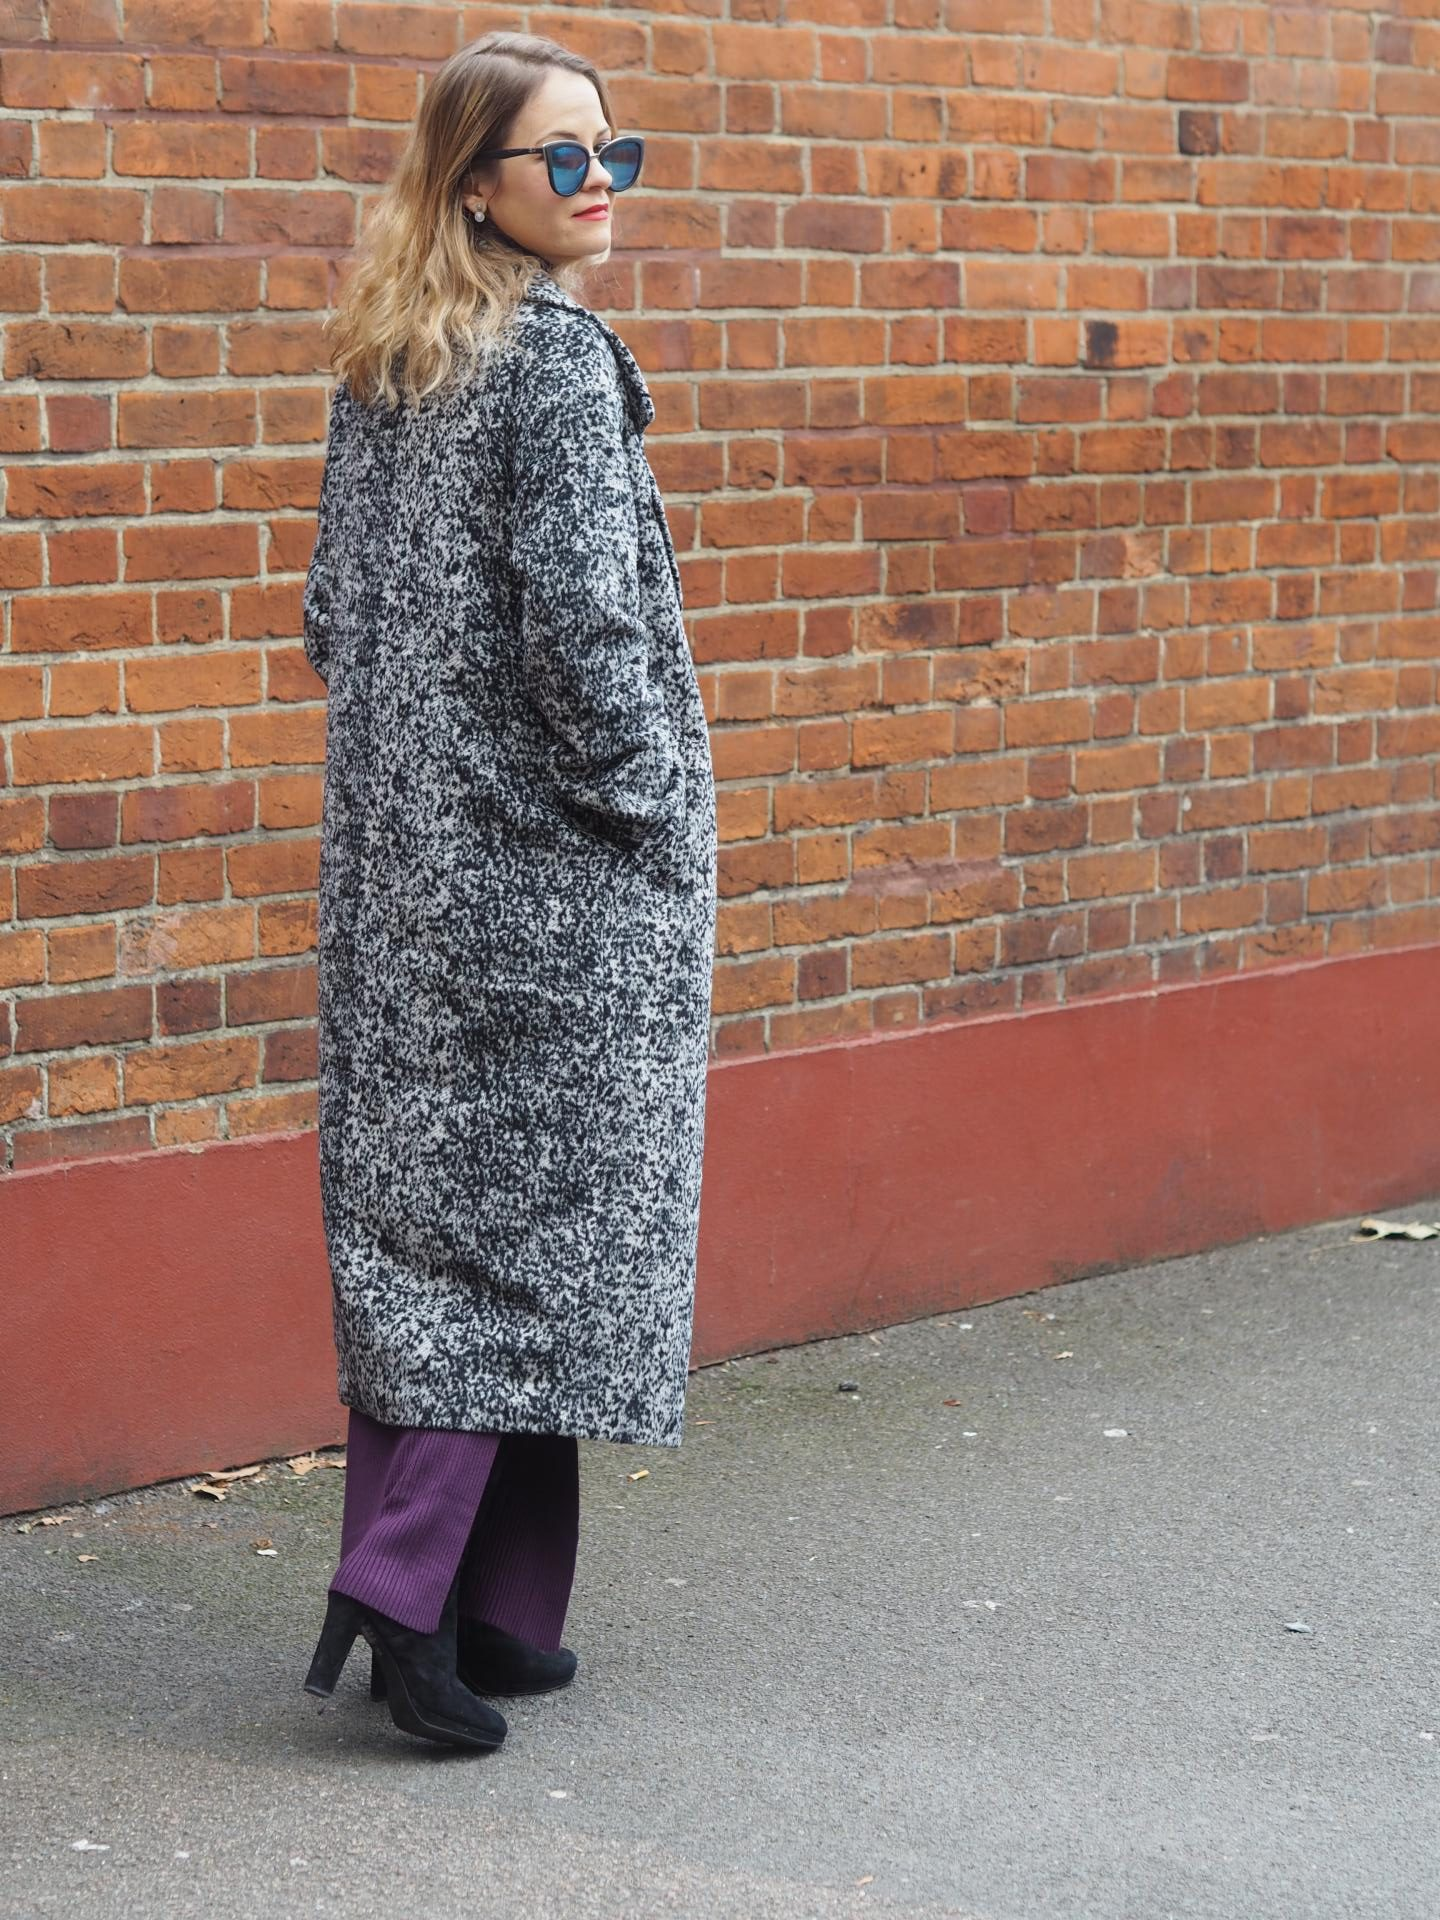 Fashion blogger lookbook